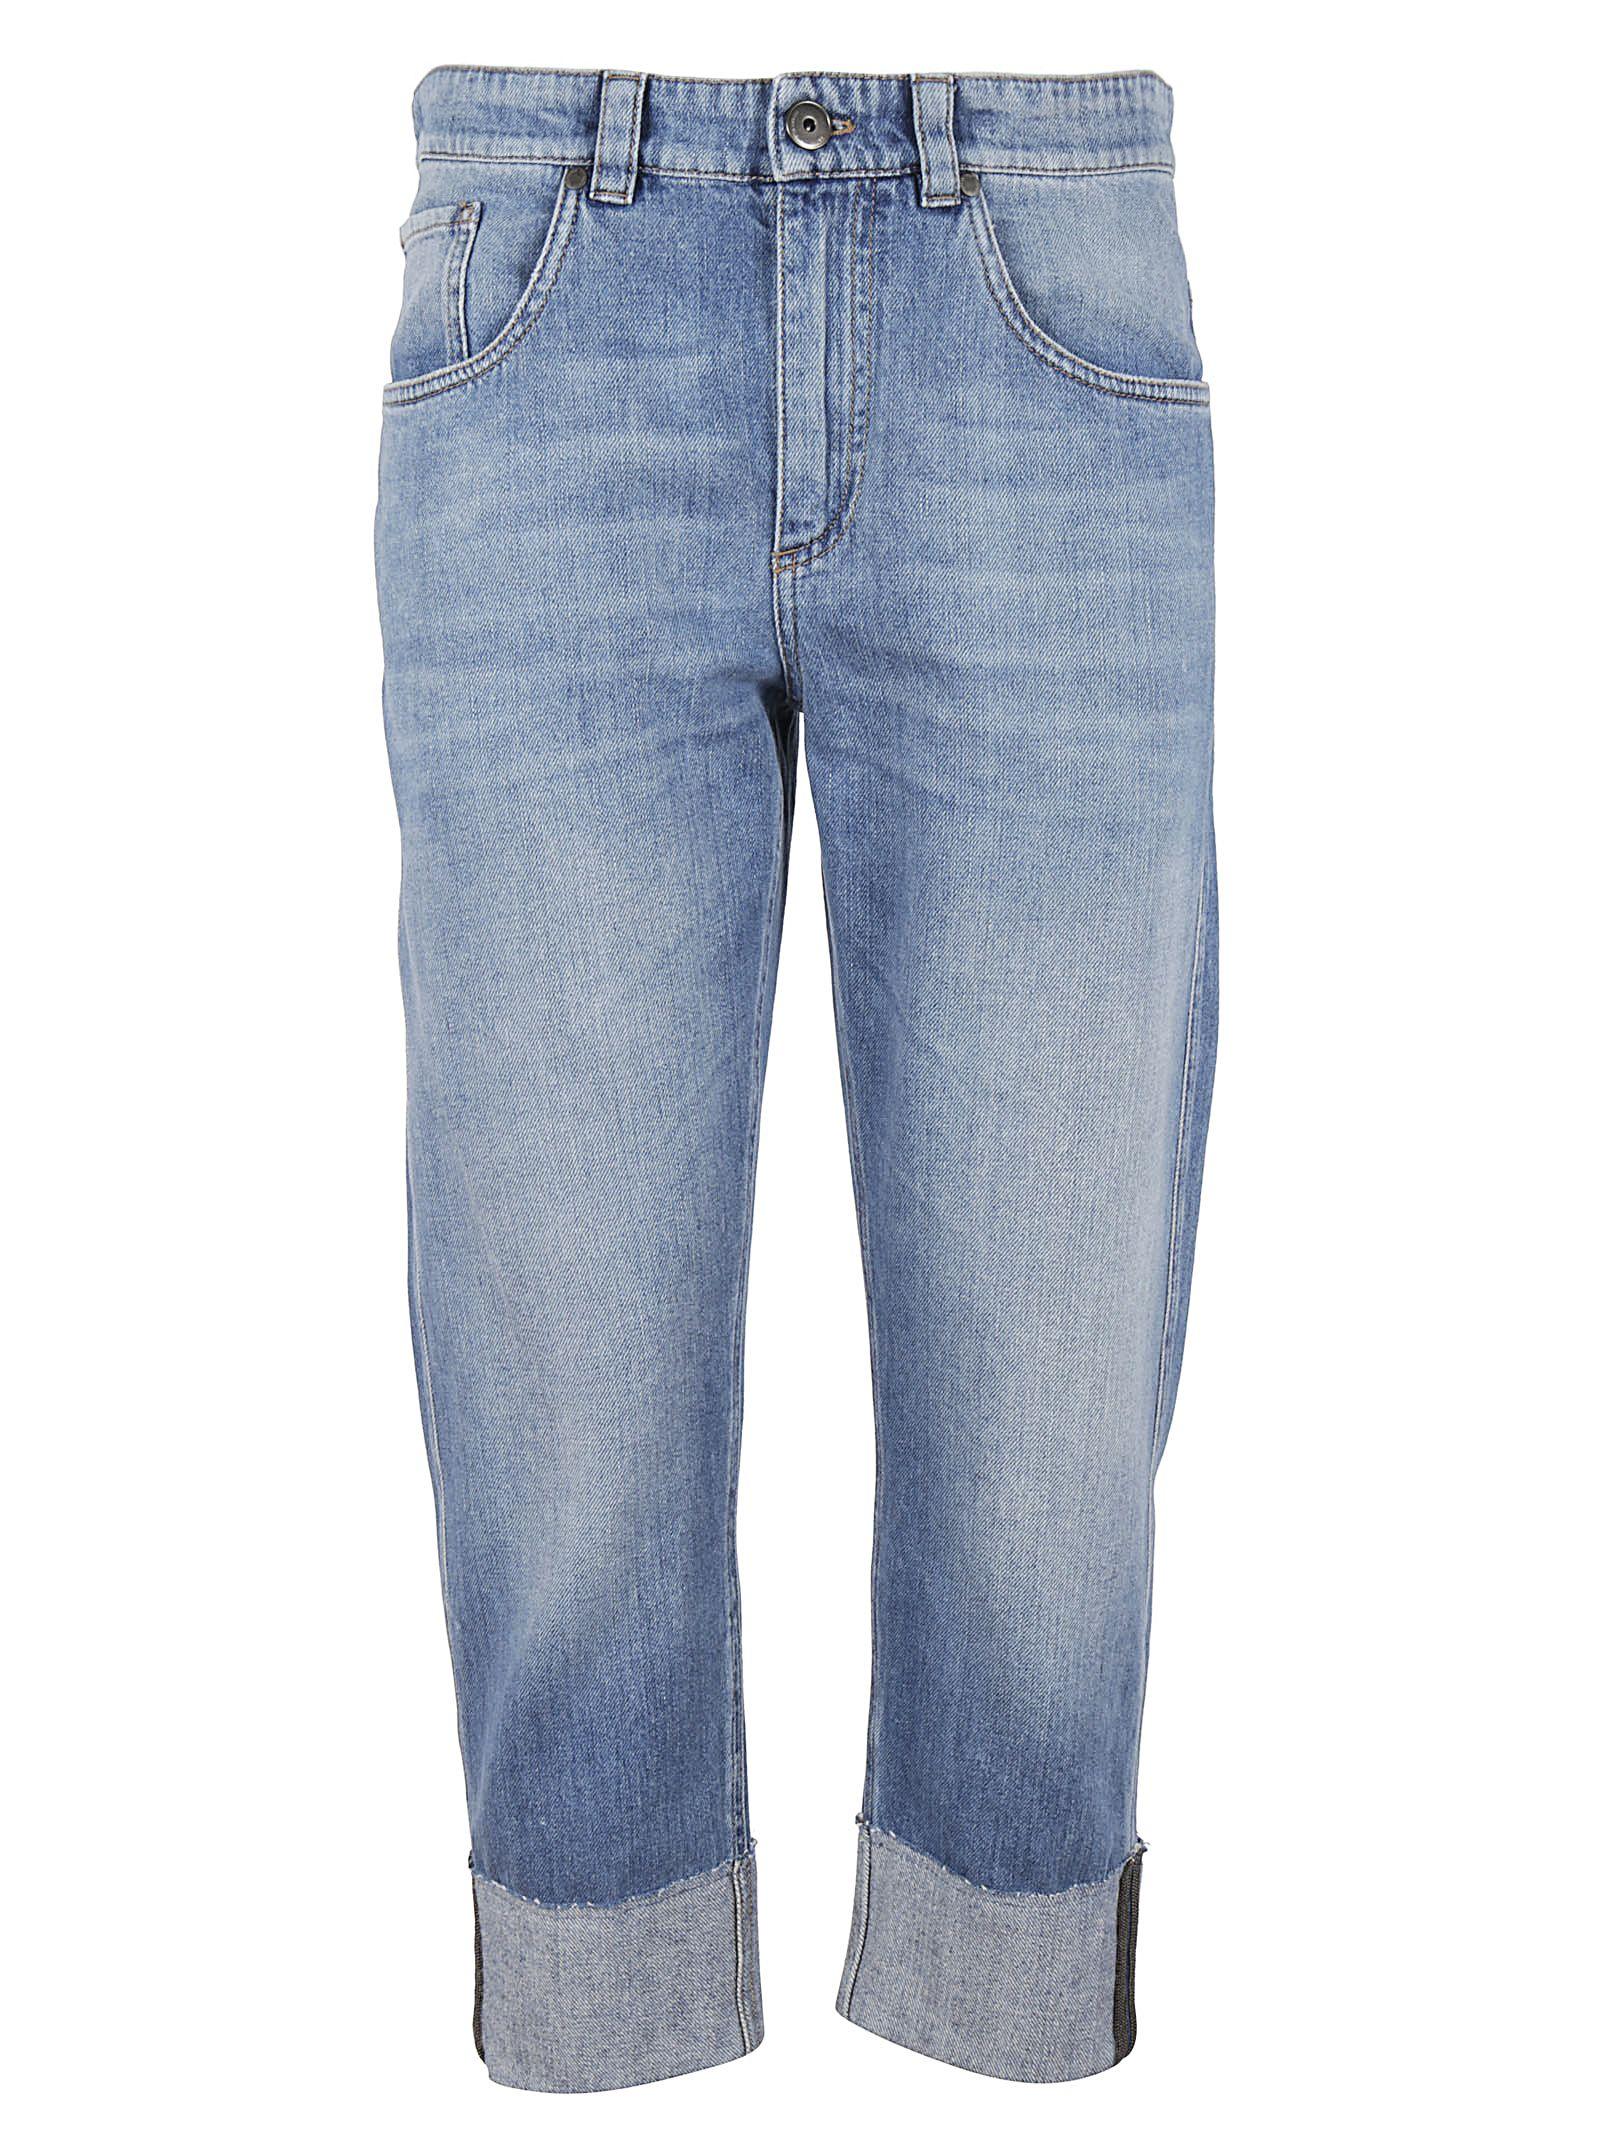 Brunello Cucinelli Cropped Jeans